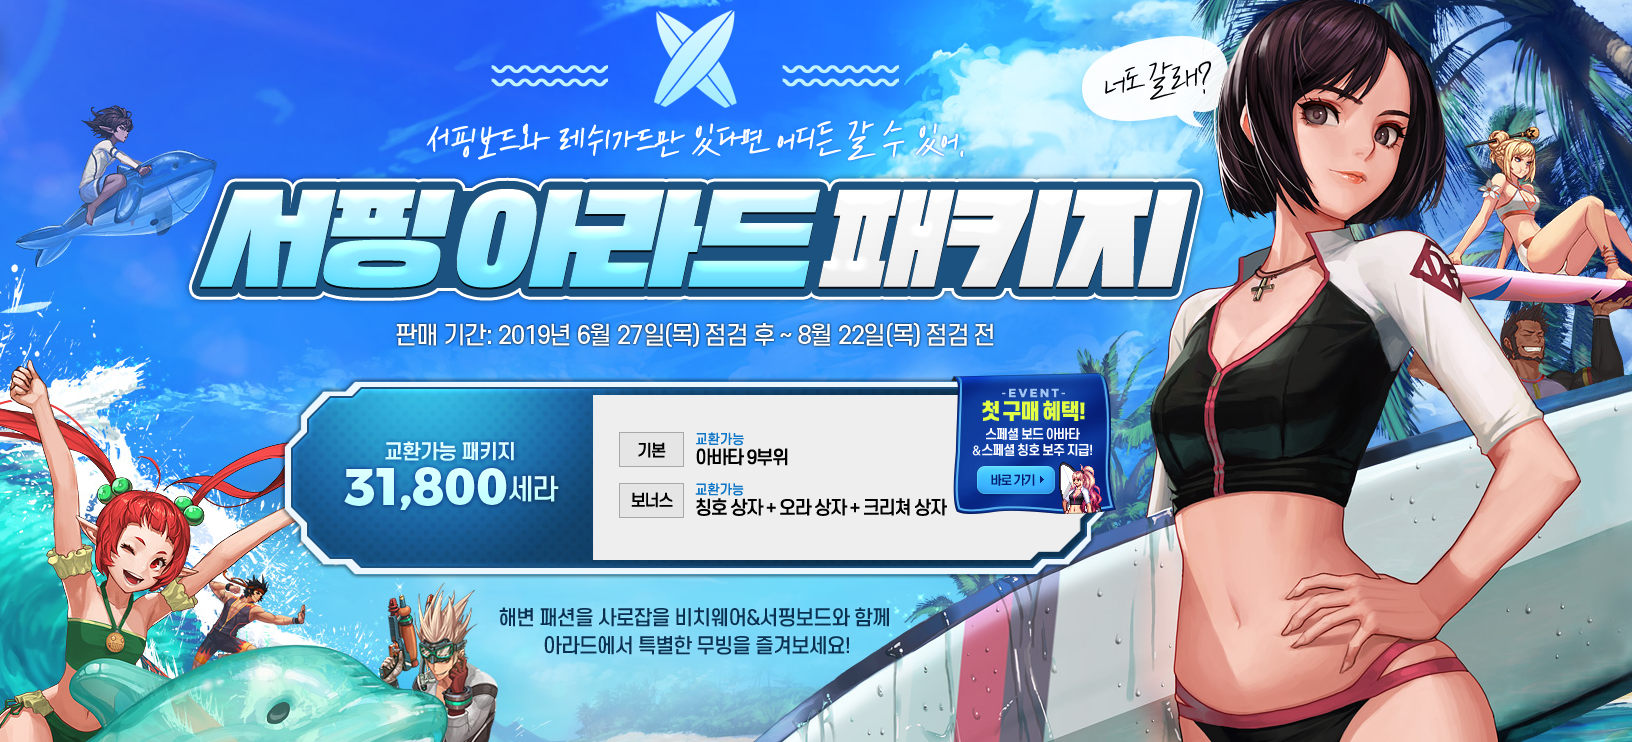 DNF2019韩服夏日套上架 外观光环特效一览